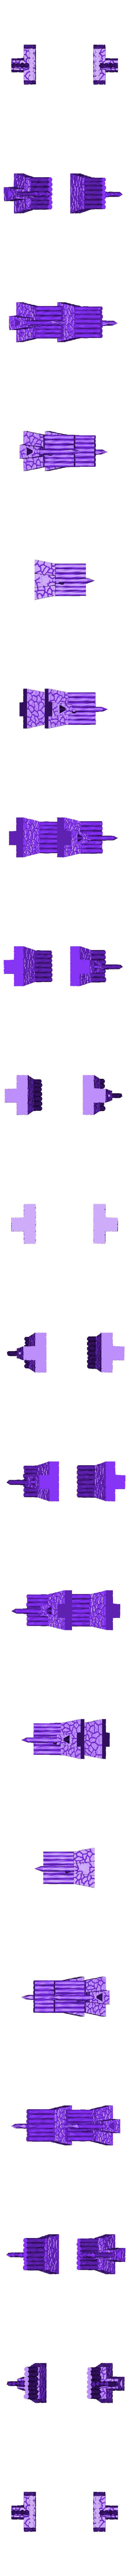 viking-palisade-gate-wall_fixed.stl Download free STL file Fantasy viking palisade gate (28mm) • Object to 3D print, Terrain4Print